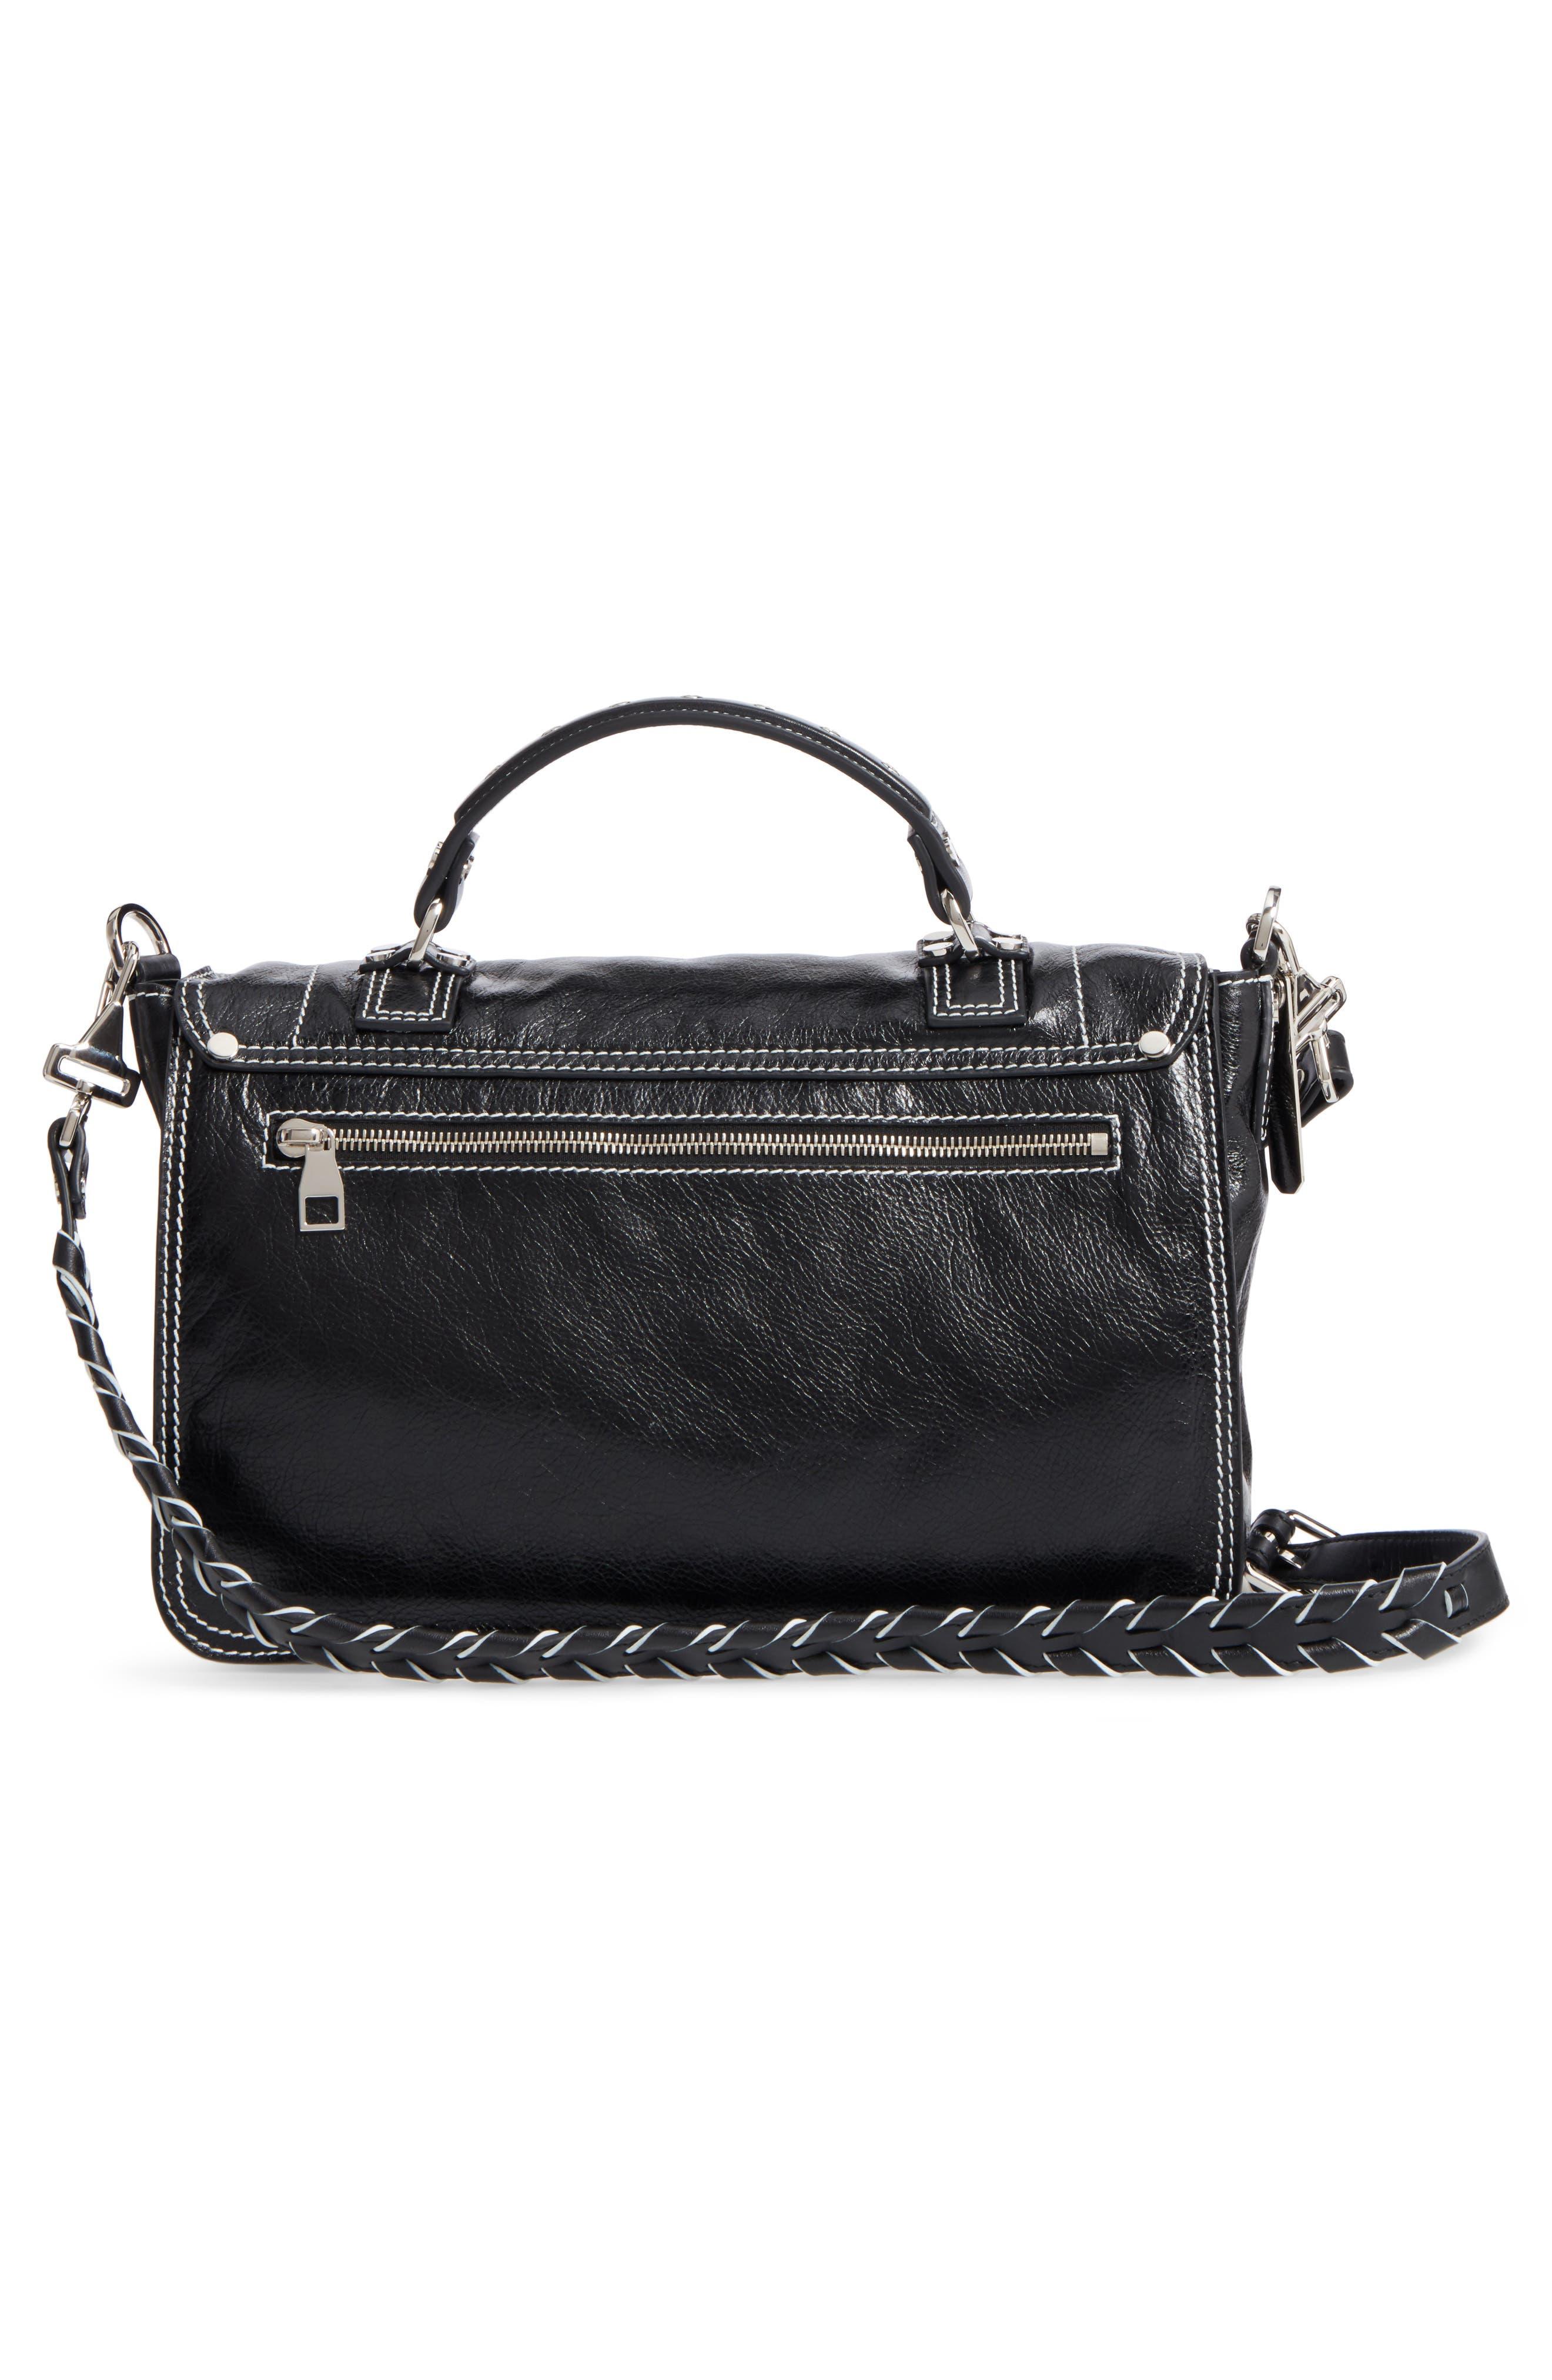 Alternate Image 2  - Proenza Schouler Medium PS1 Calfskin Leather Satchel